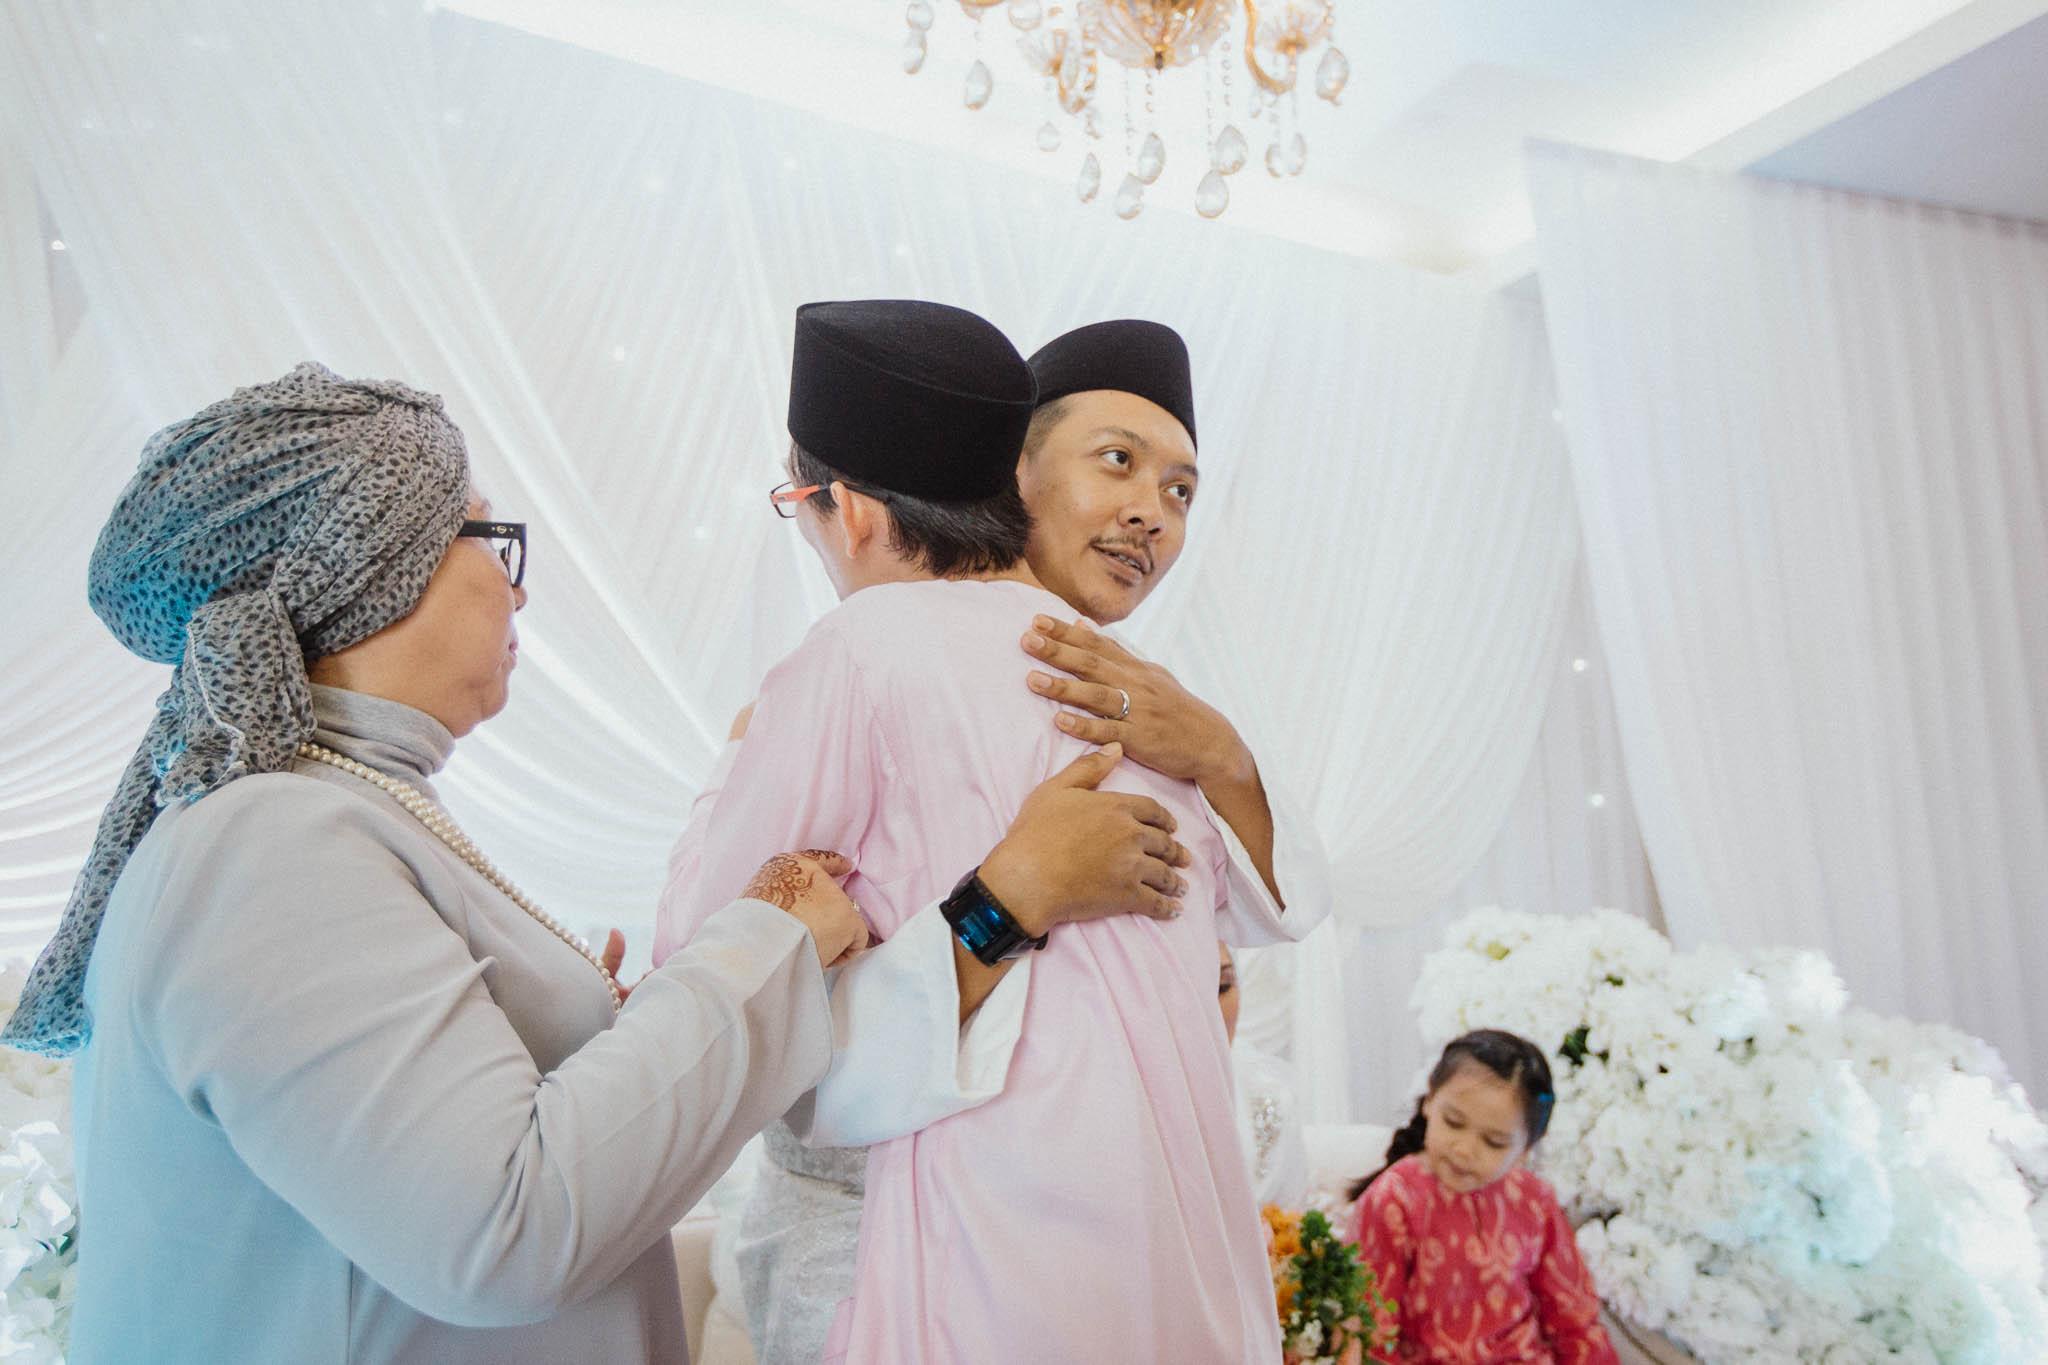 singapore-wedding-photographer-addafiq-nufail-031.jpg